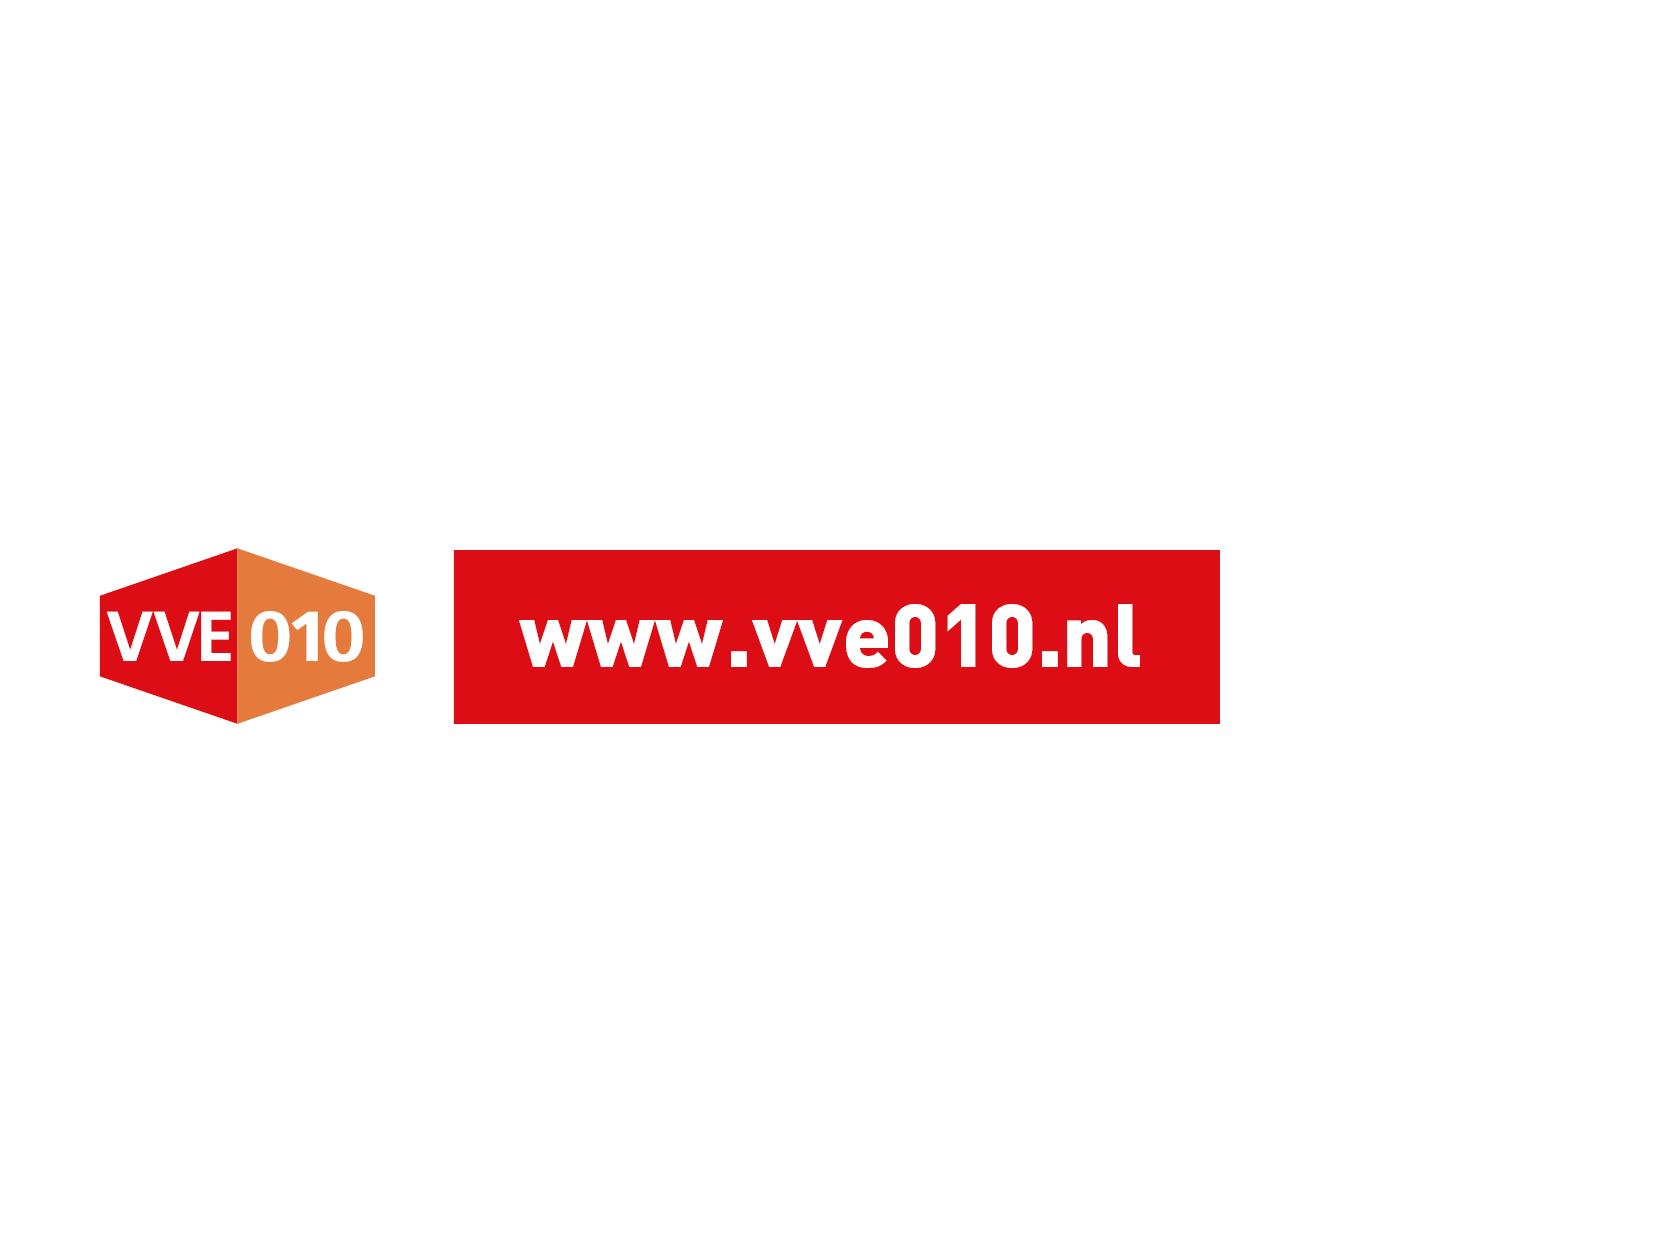 logo-dak3.jpg